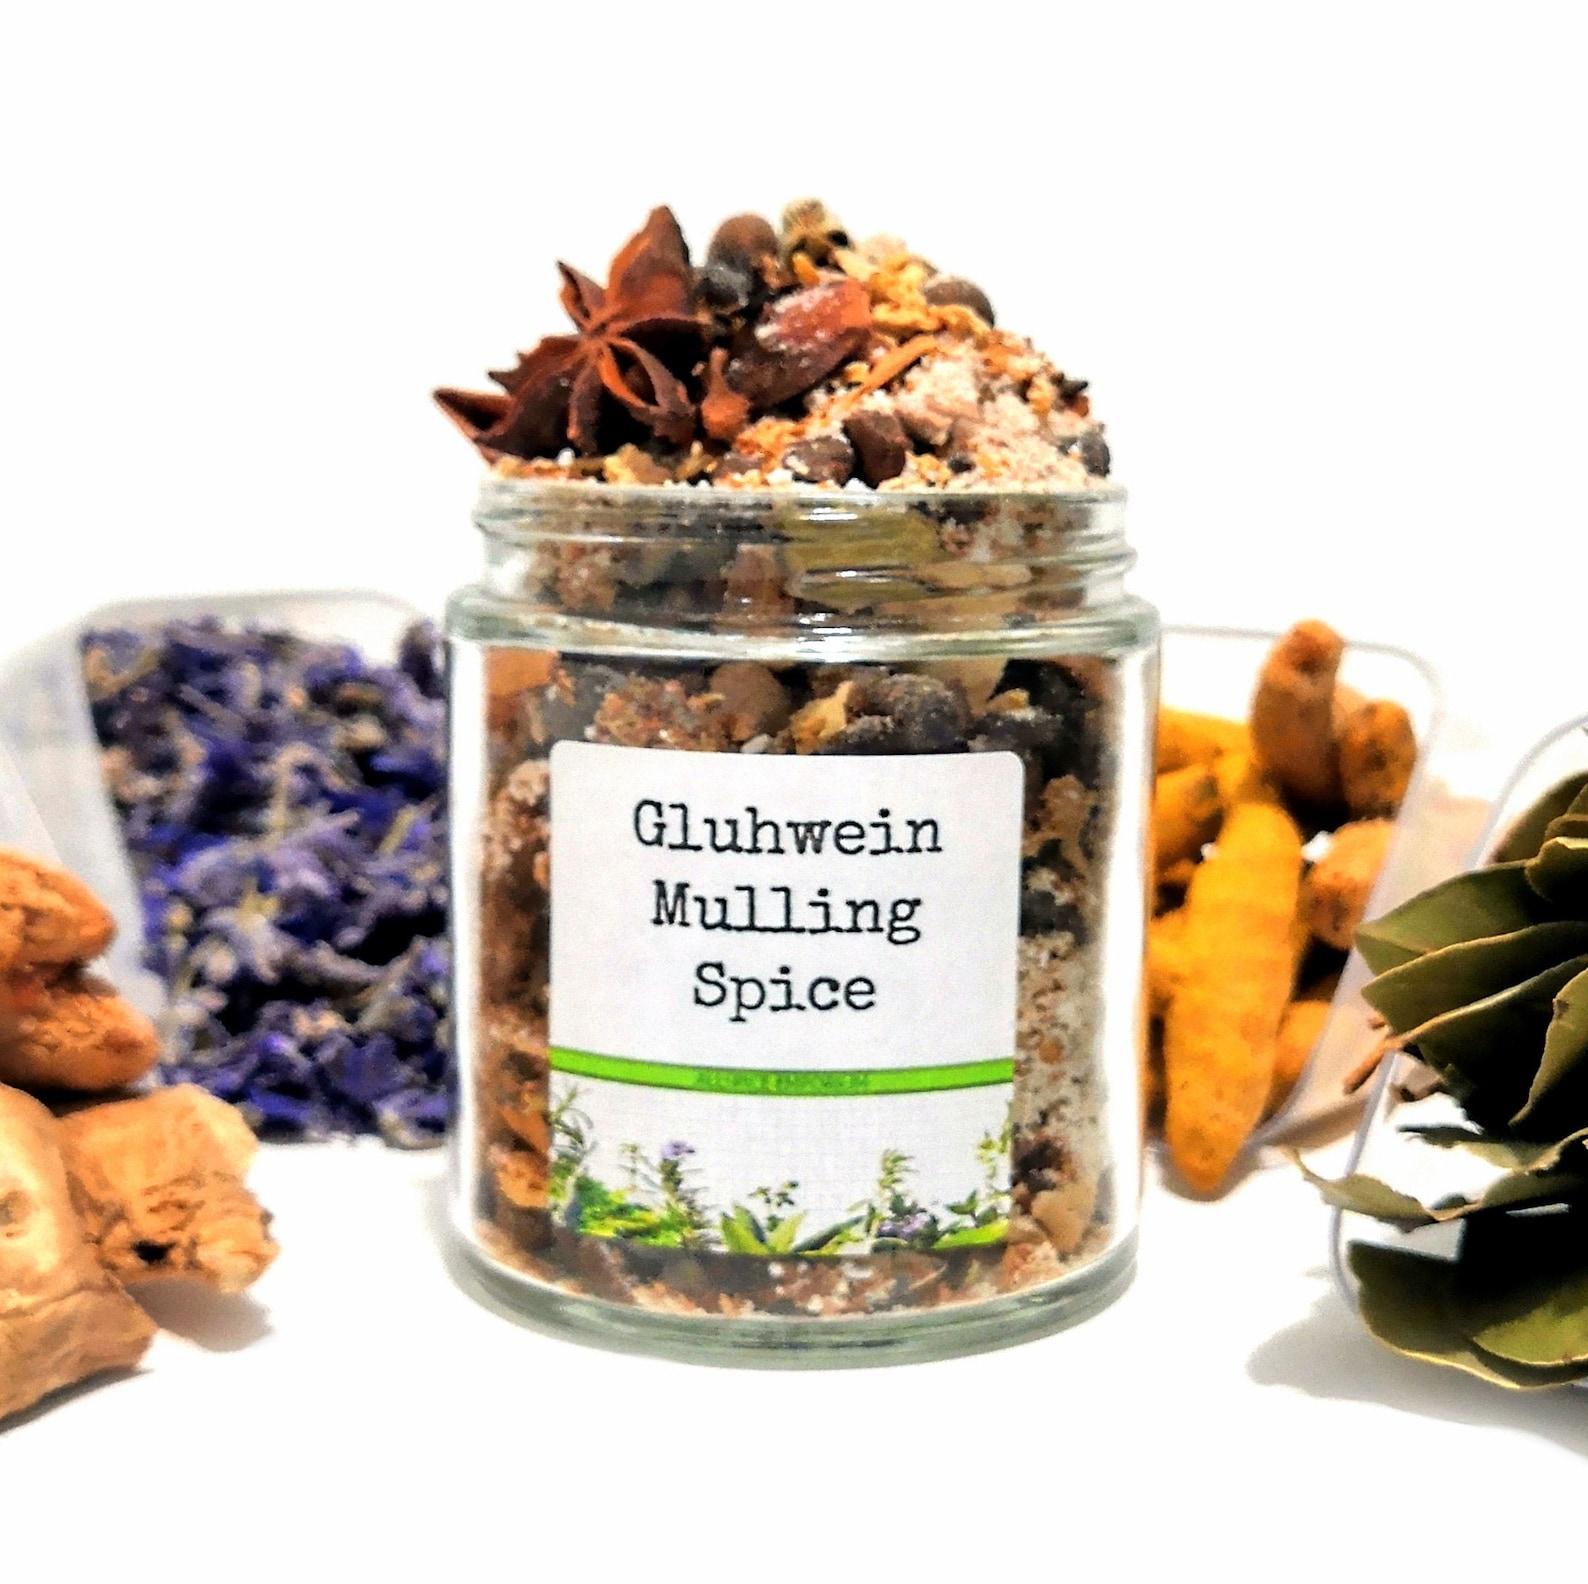 Glühwein Mulling Spice